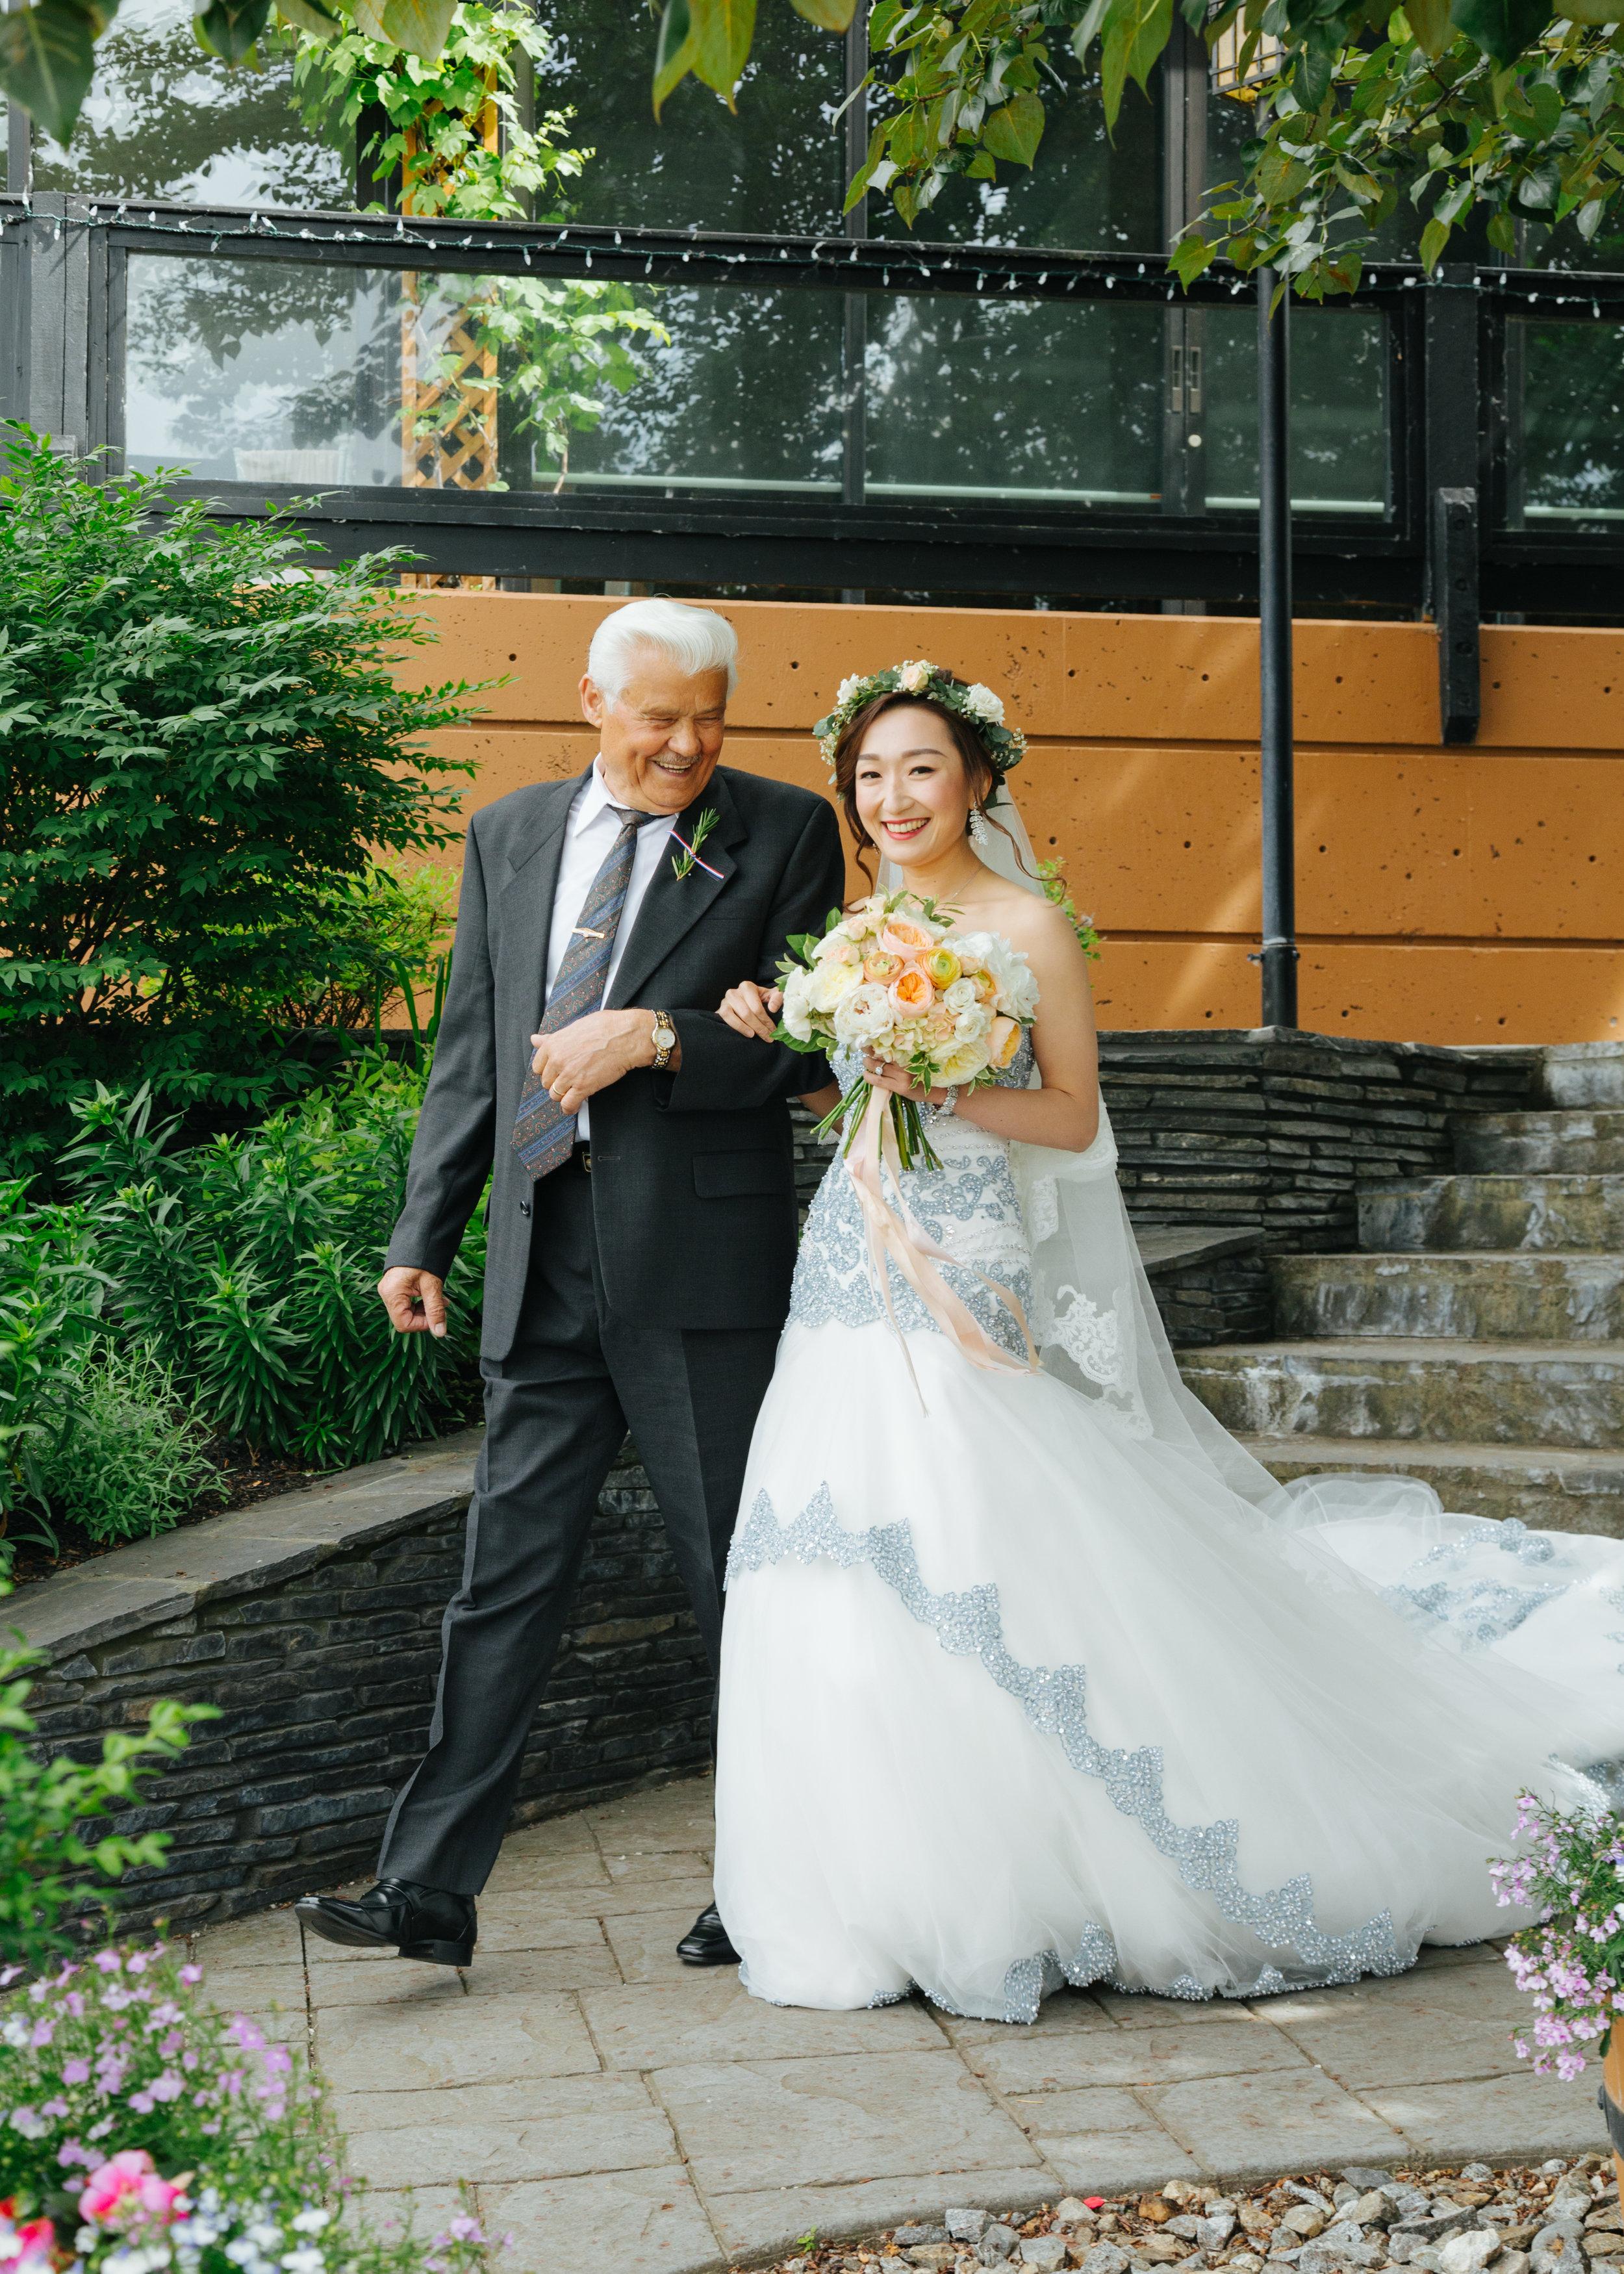 herastudios_wedding_jill_ivan_hera_selects-15.jpg